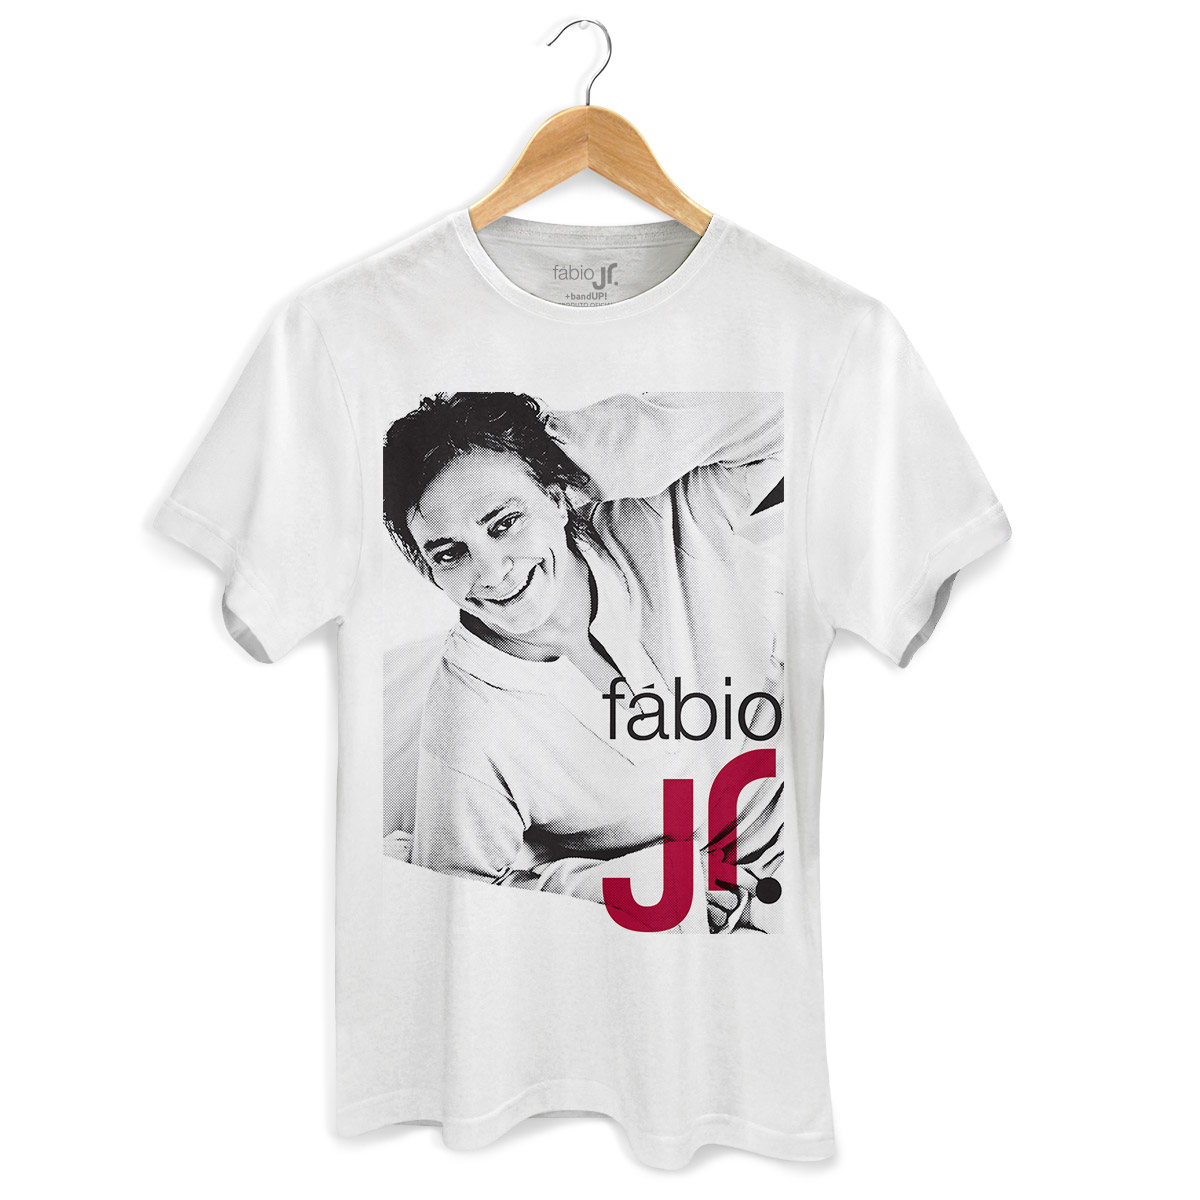 Camiseta Fábio Jr. - Modelo 2